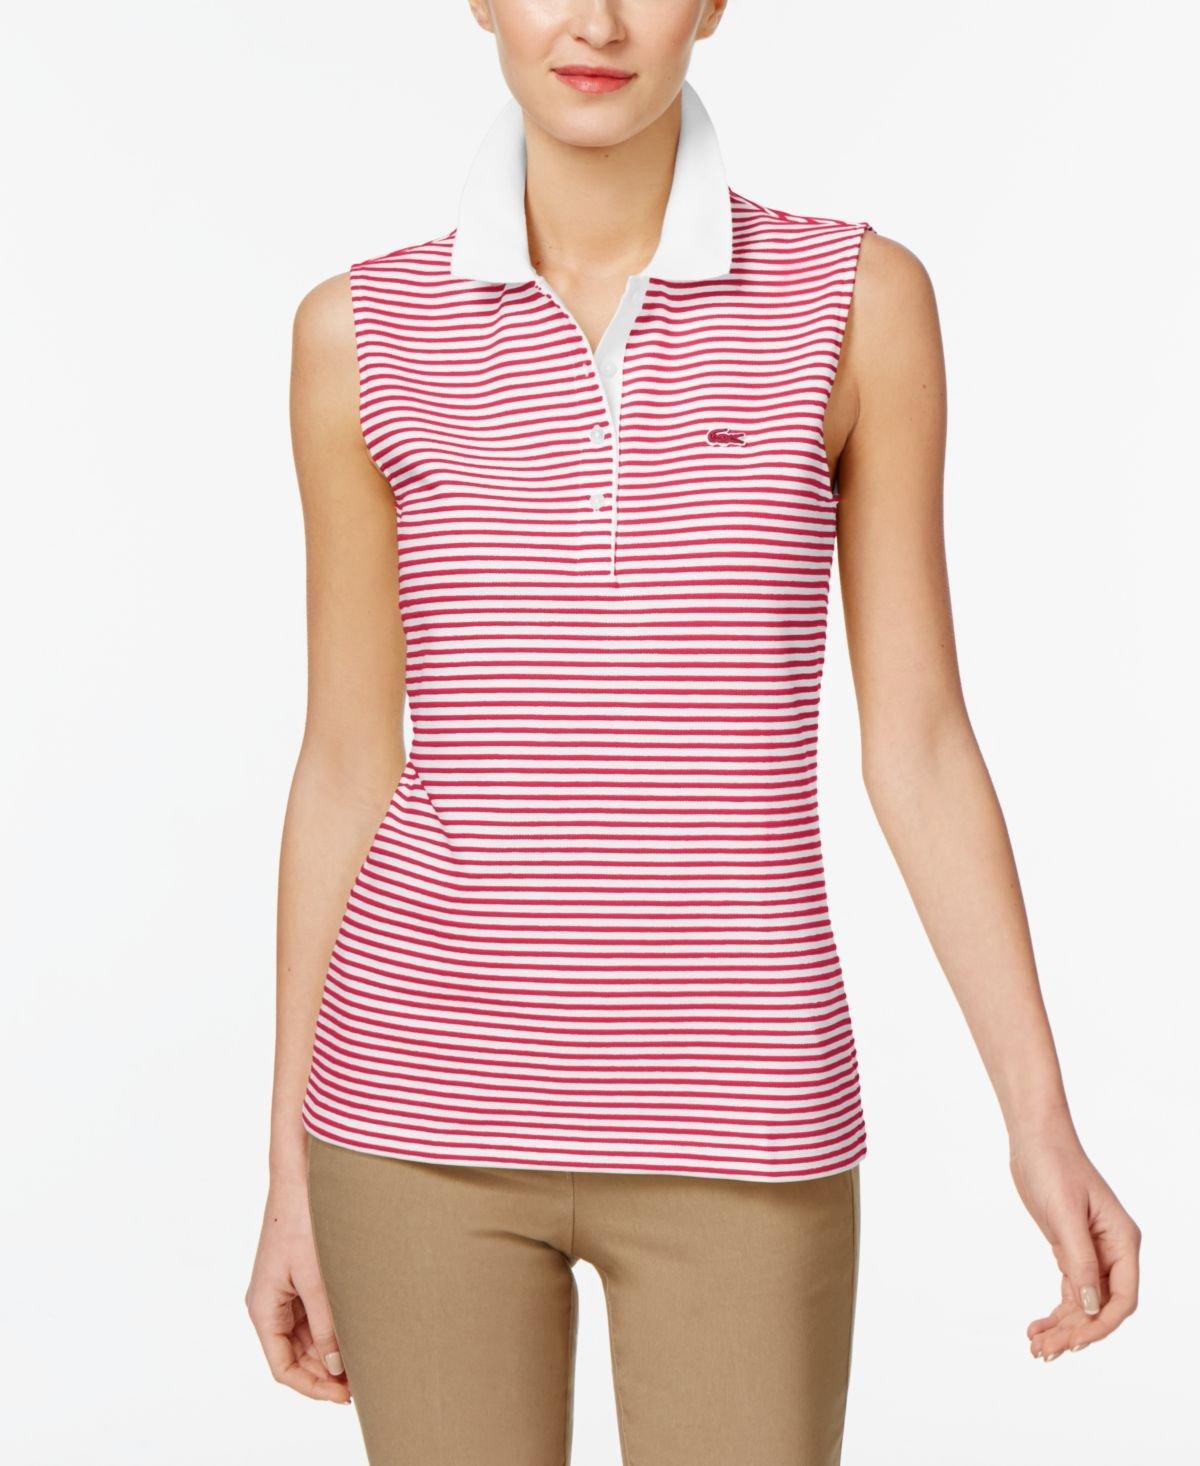 61a5bfc08 Galleon - Lacoste Women s Sleeveless Striped Ottoman Pique Polo ...